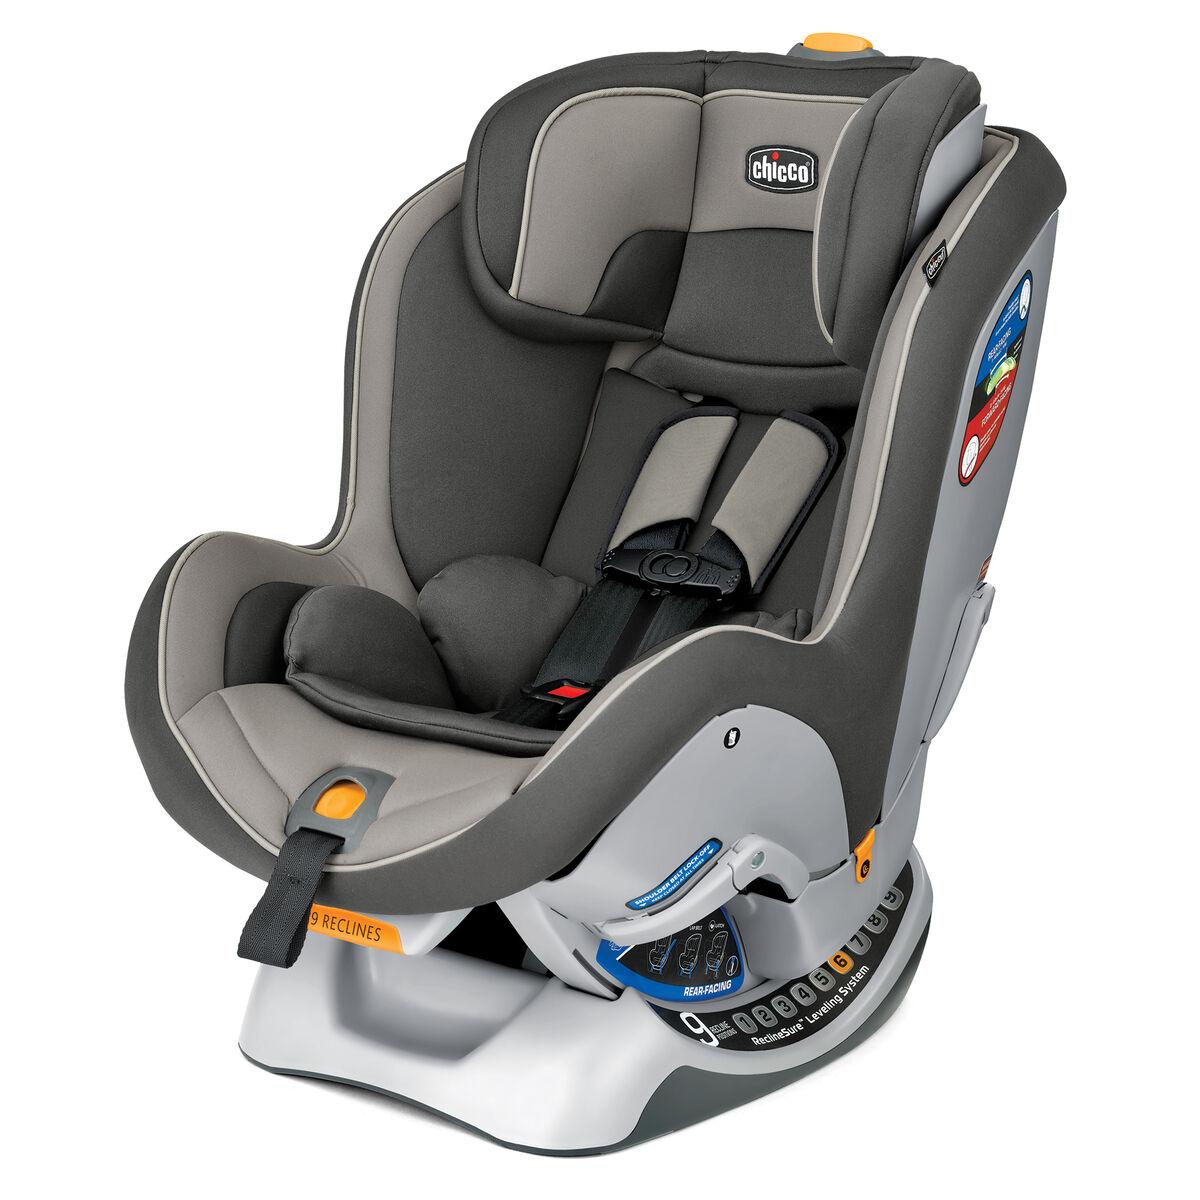 chicco nextfit convertible car seat  infiniti - nextfit convertible car seat  infinitinextfit convertible car seat infiniti